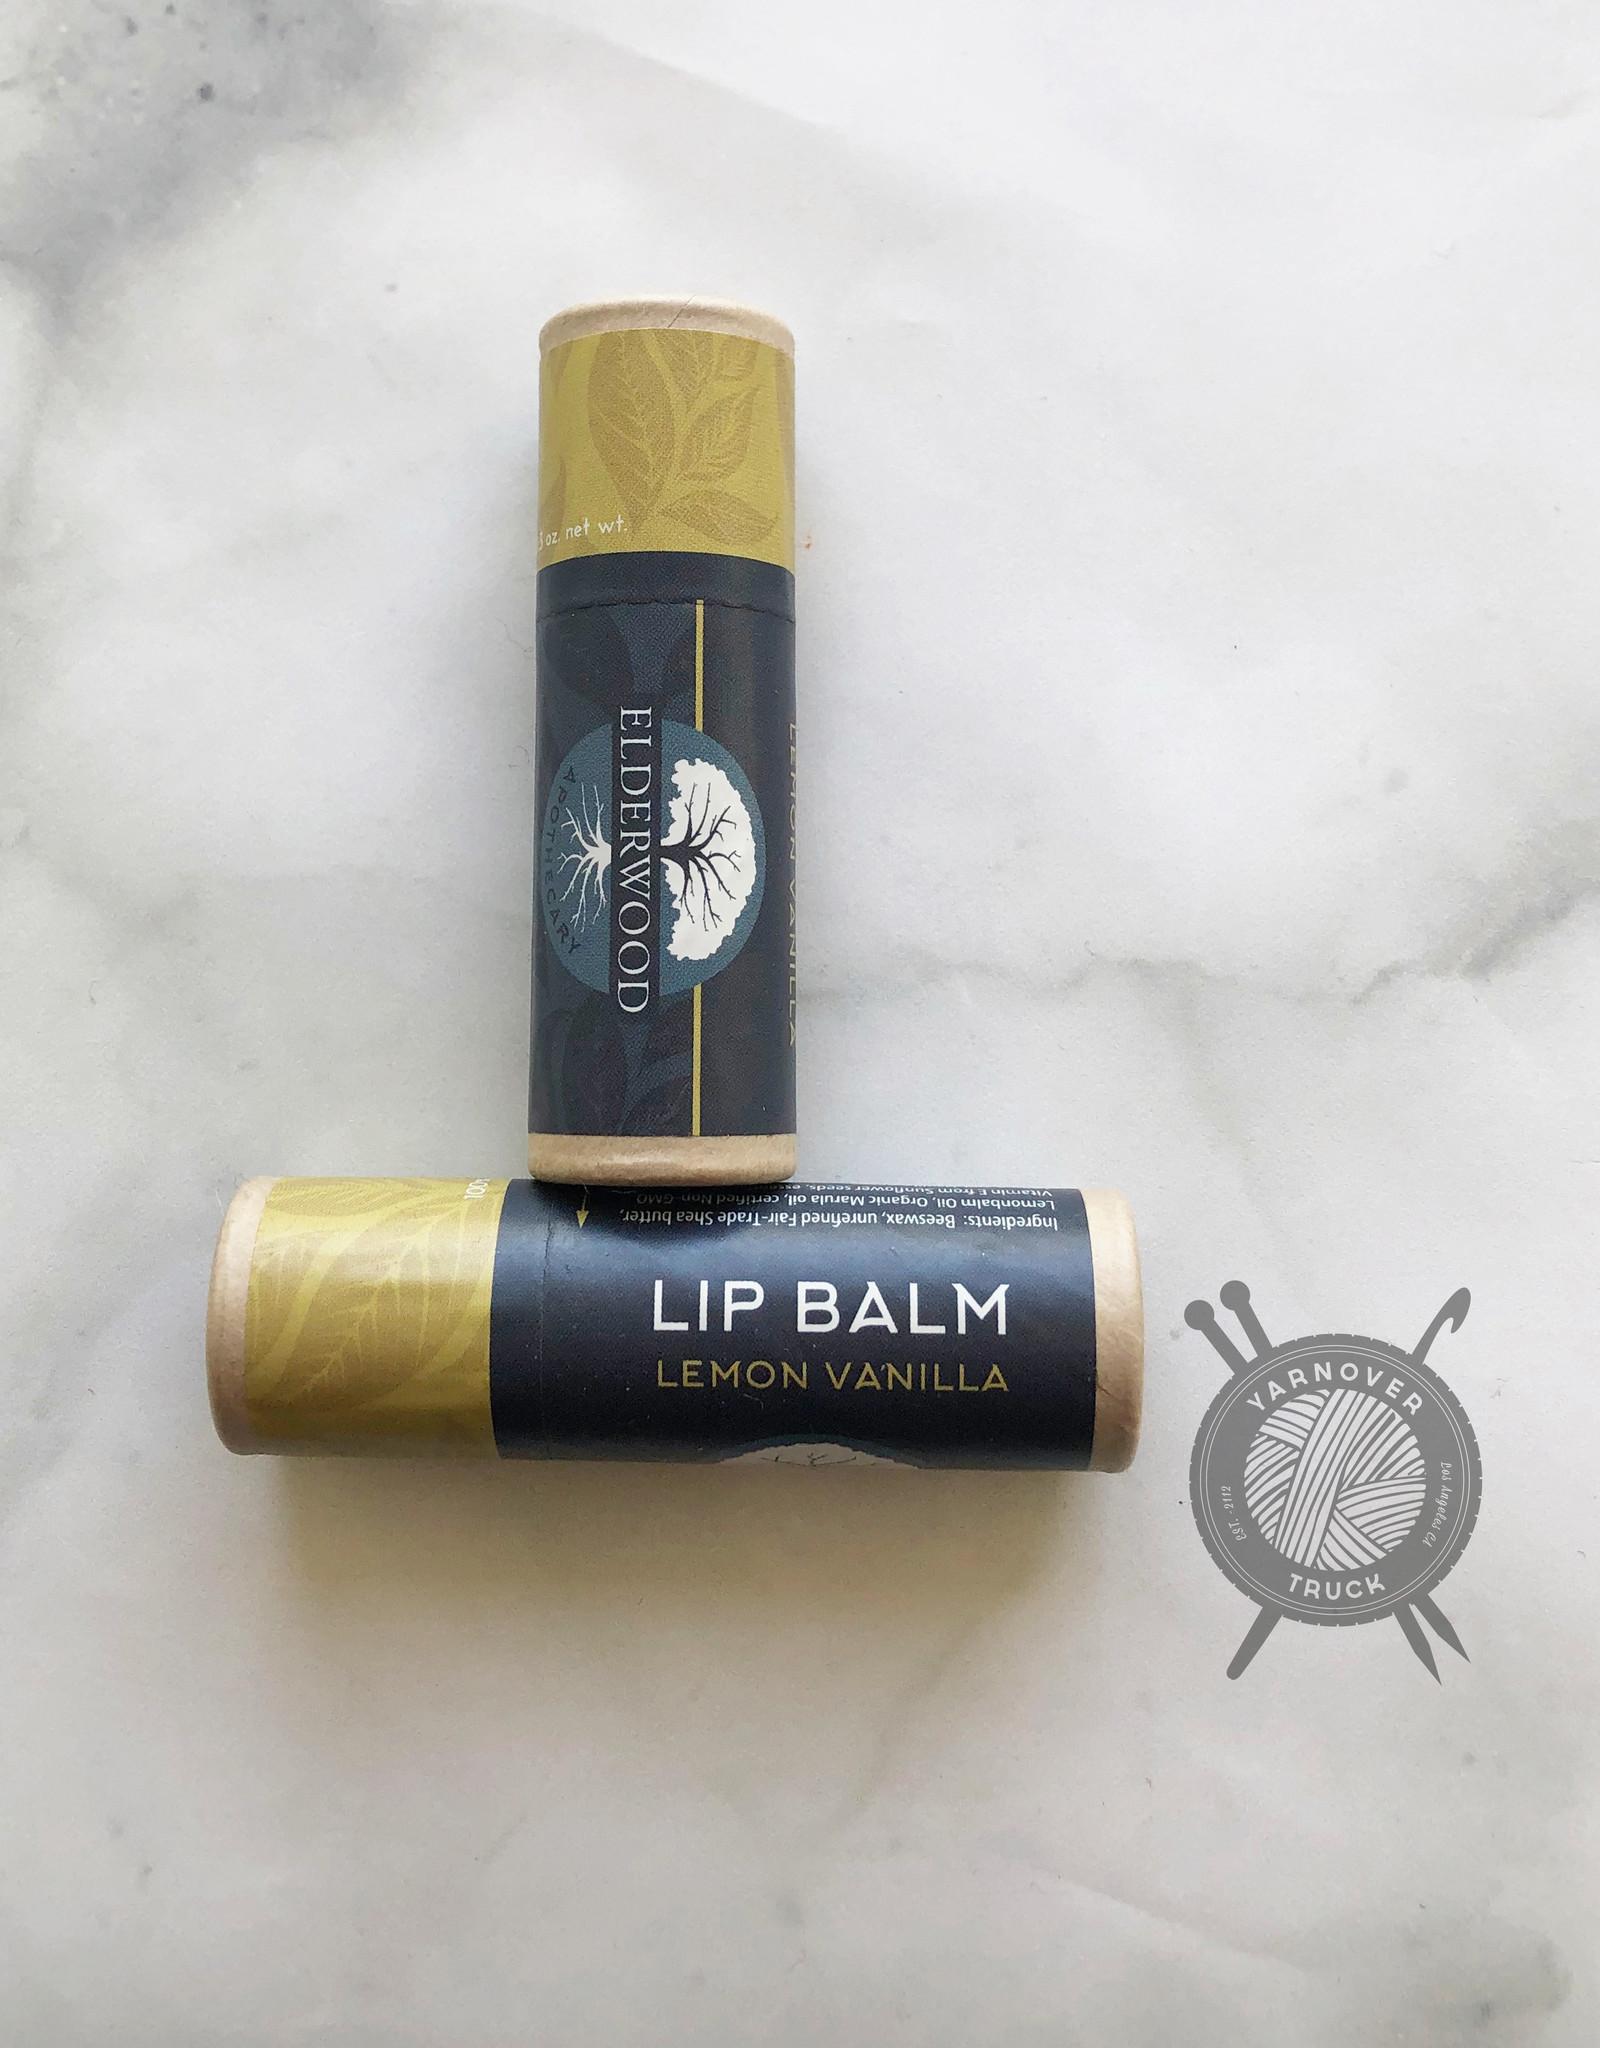 Lemon Vanilla Mint Lip Balm  from Elderwood Apothecary